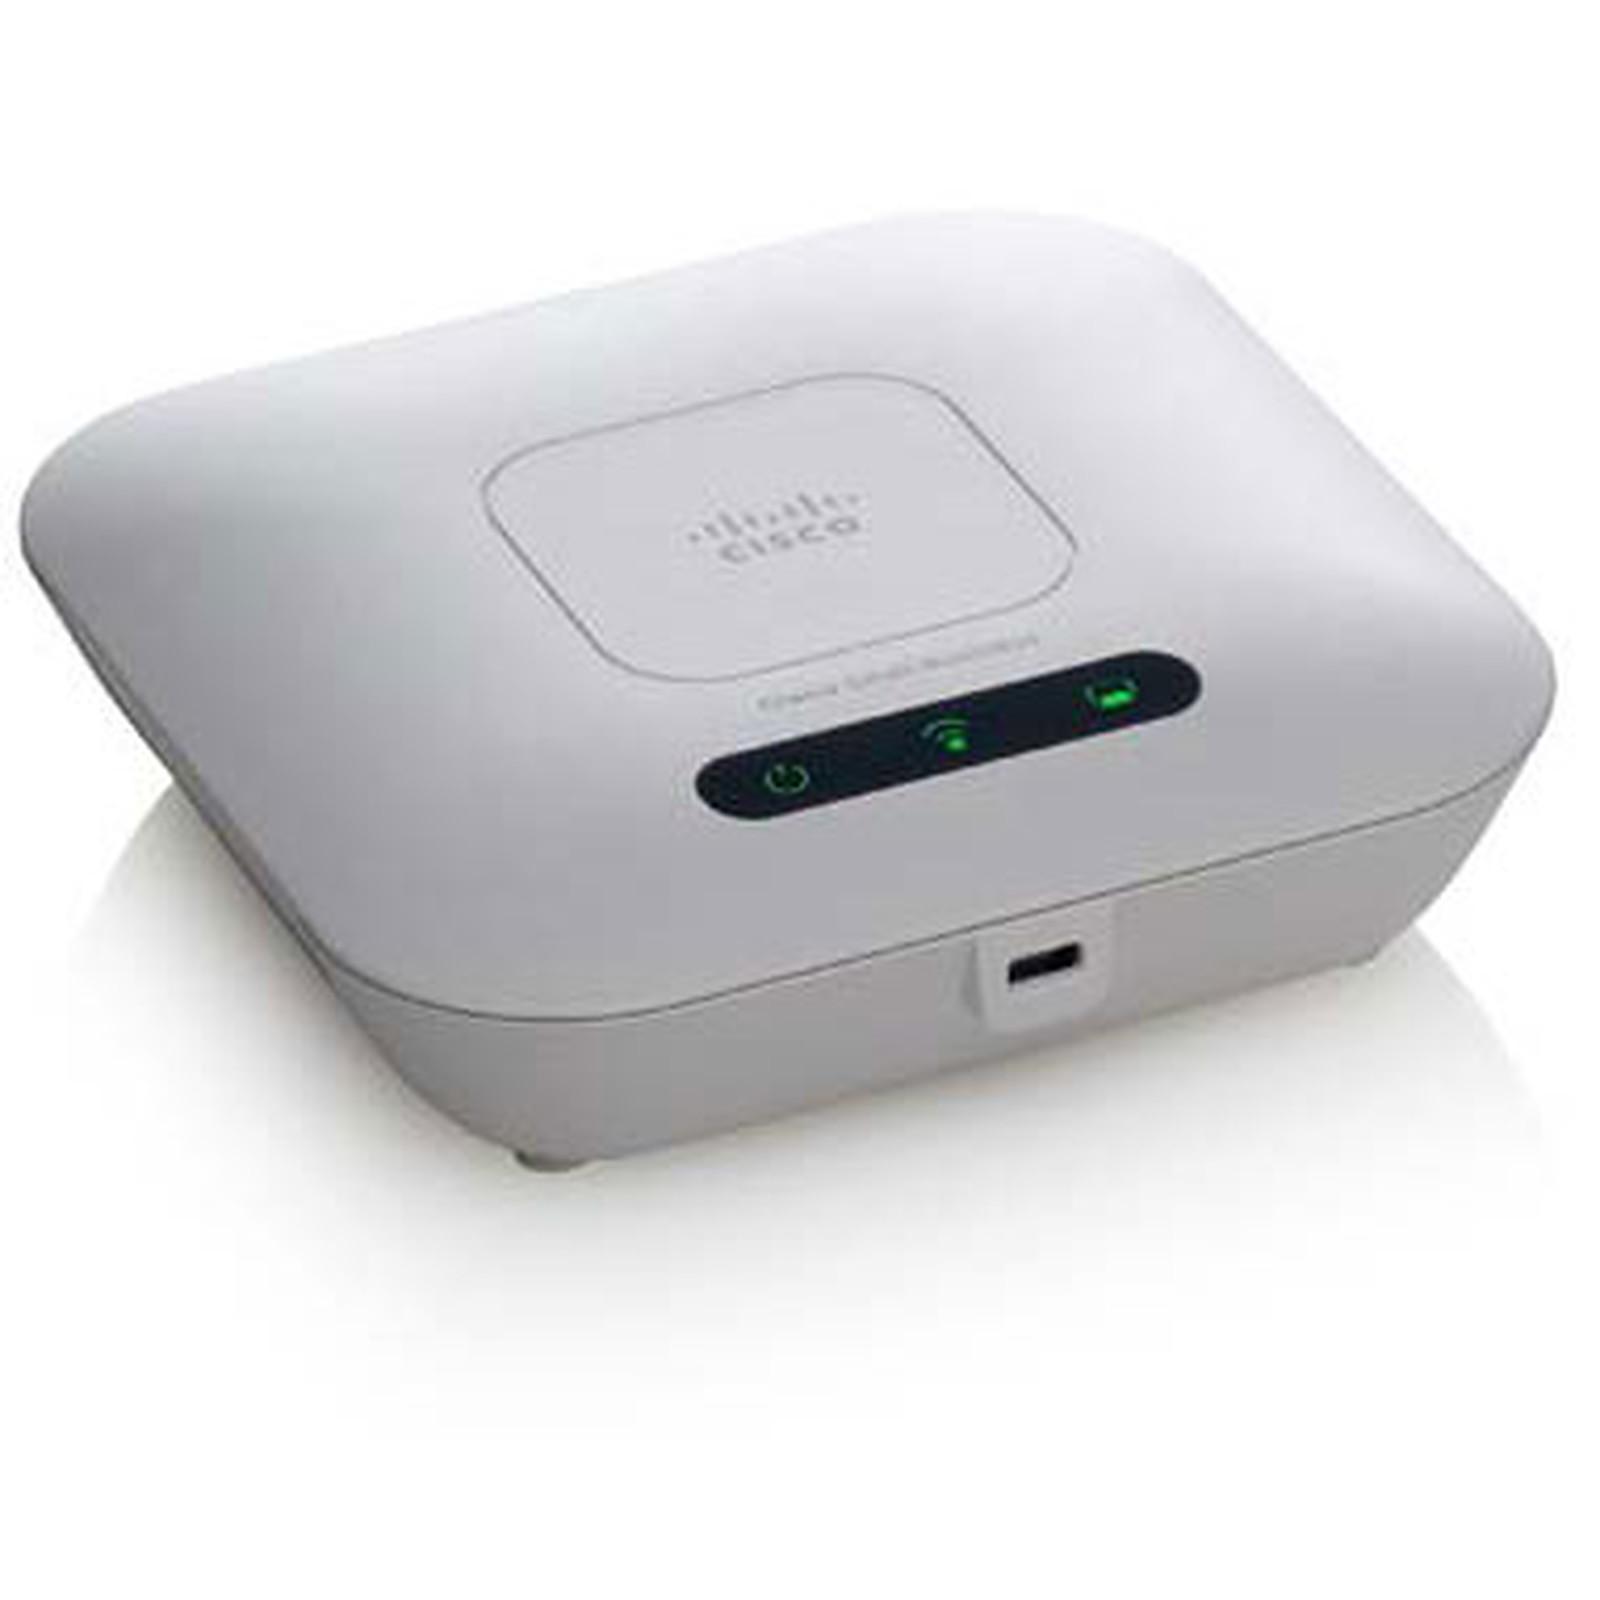 Cisco Small Business WAP121